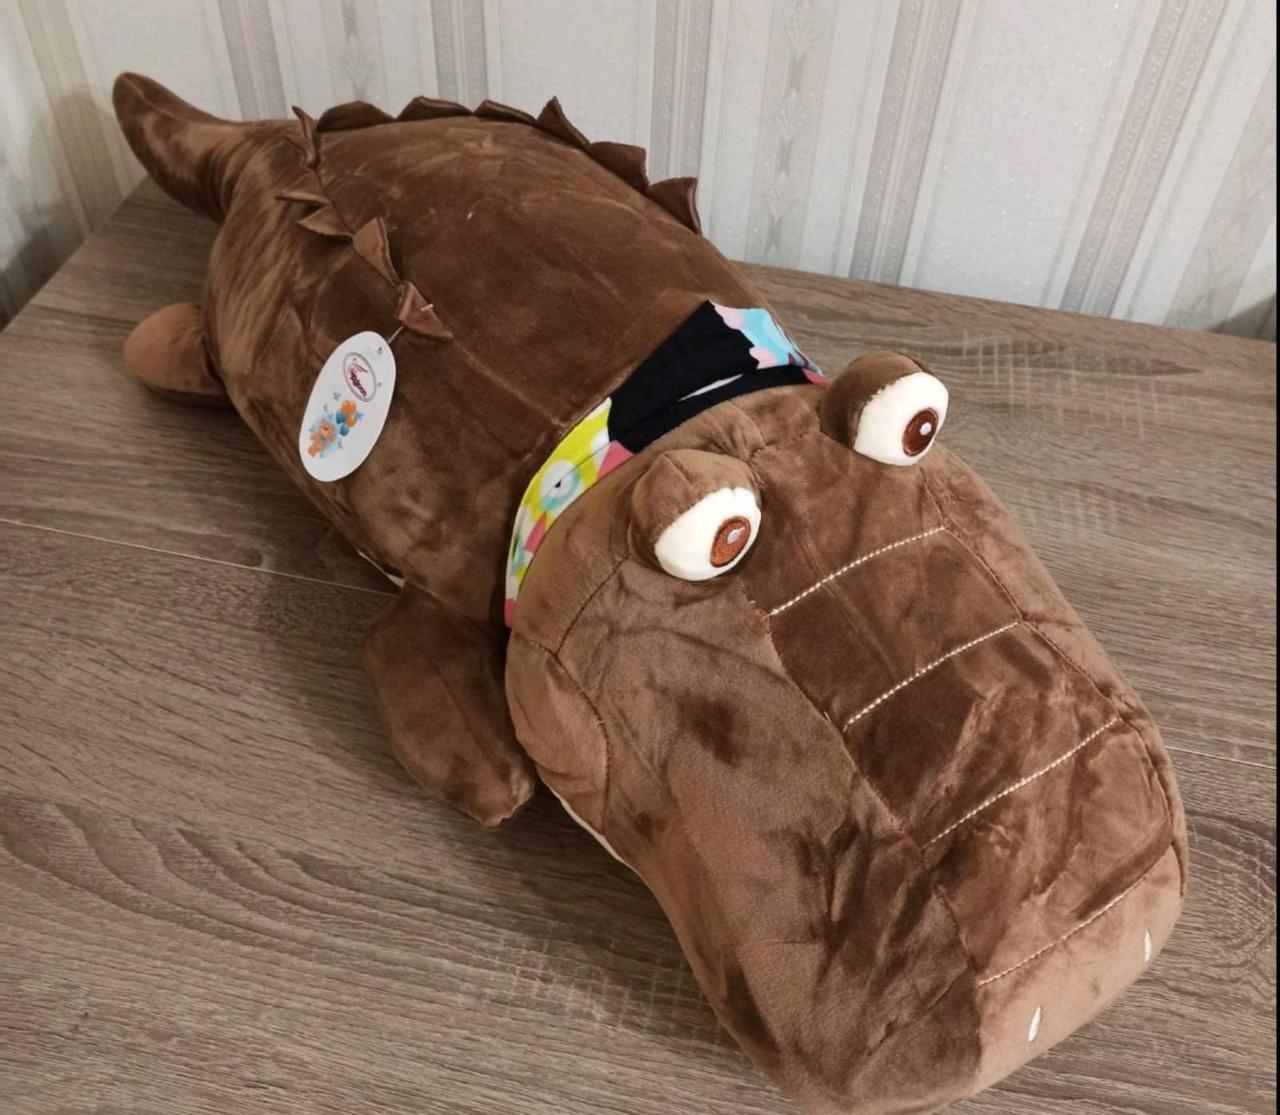 Плед игрушка подушка 3 в1 Крокодил   Игрушка детский плед   Игрушки-Подушки   Мягкая игрушка Коричневого цвета